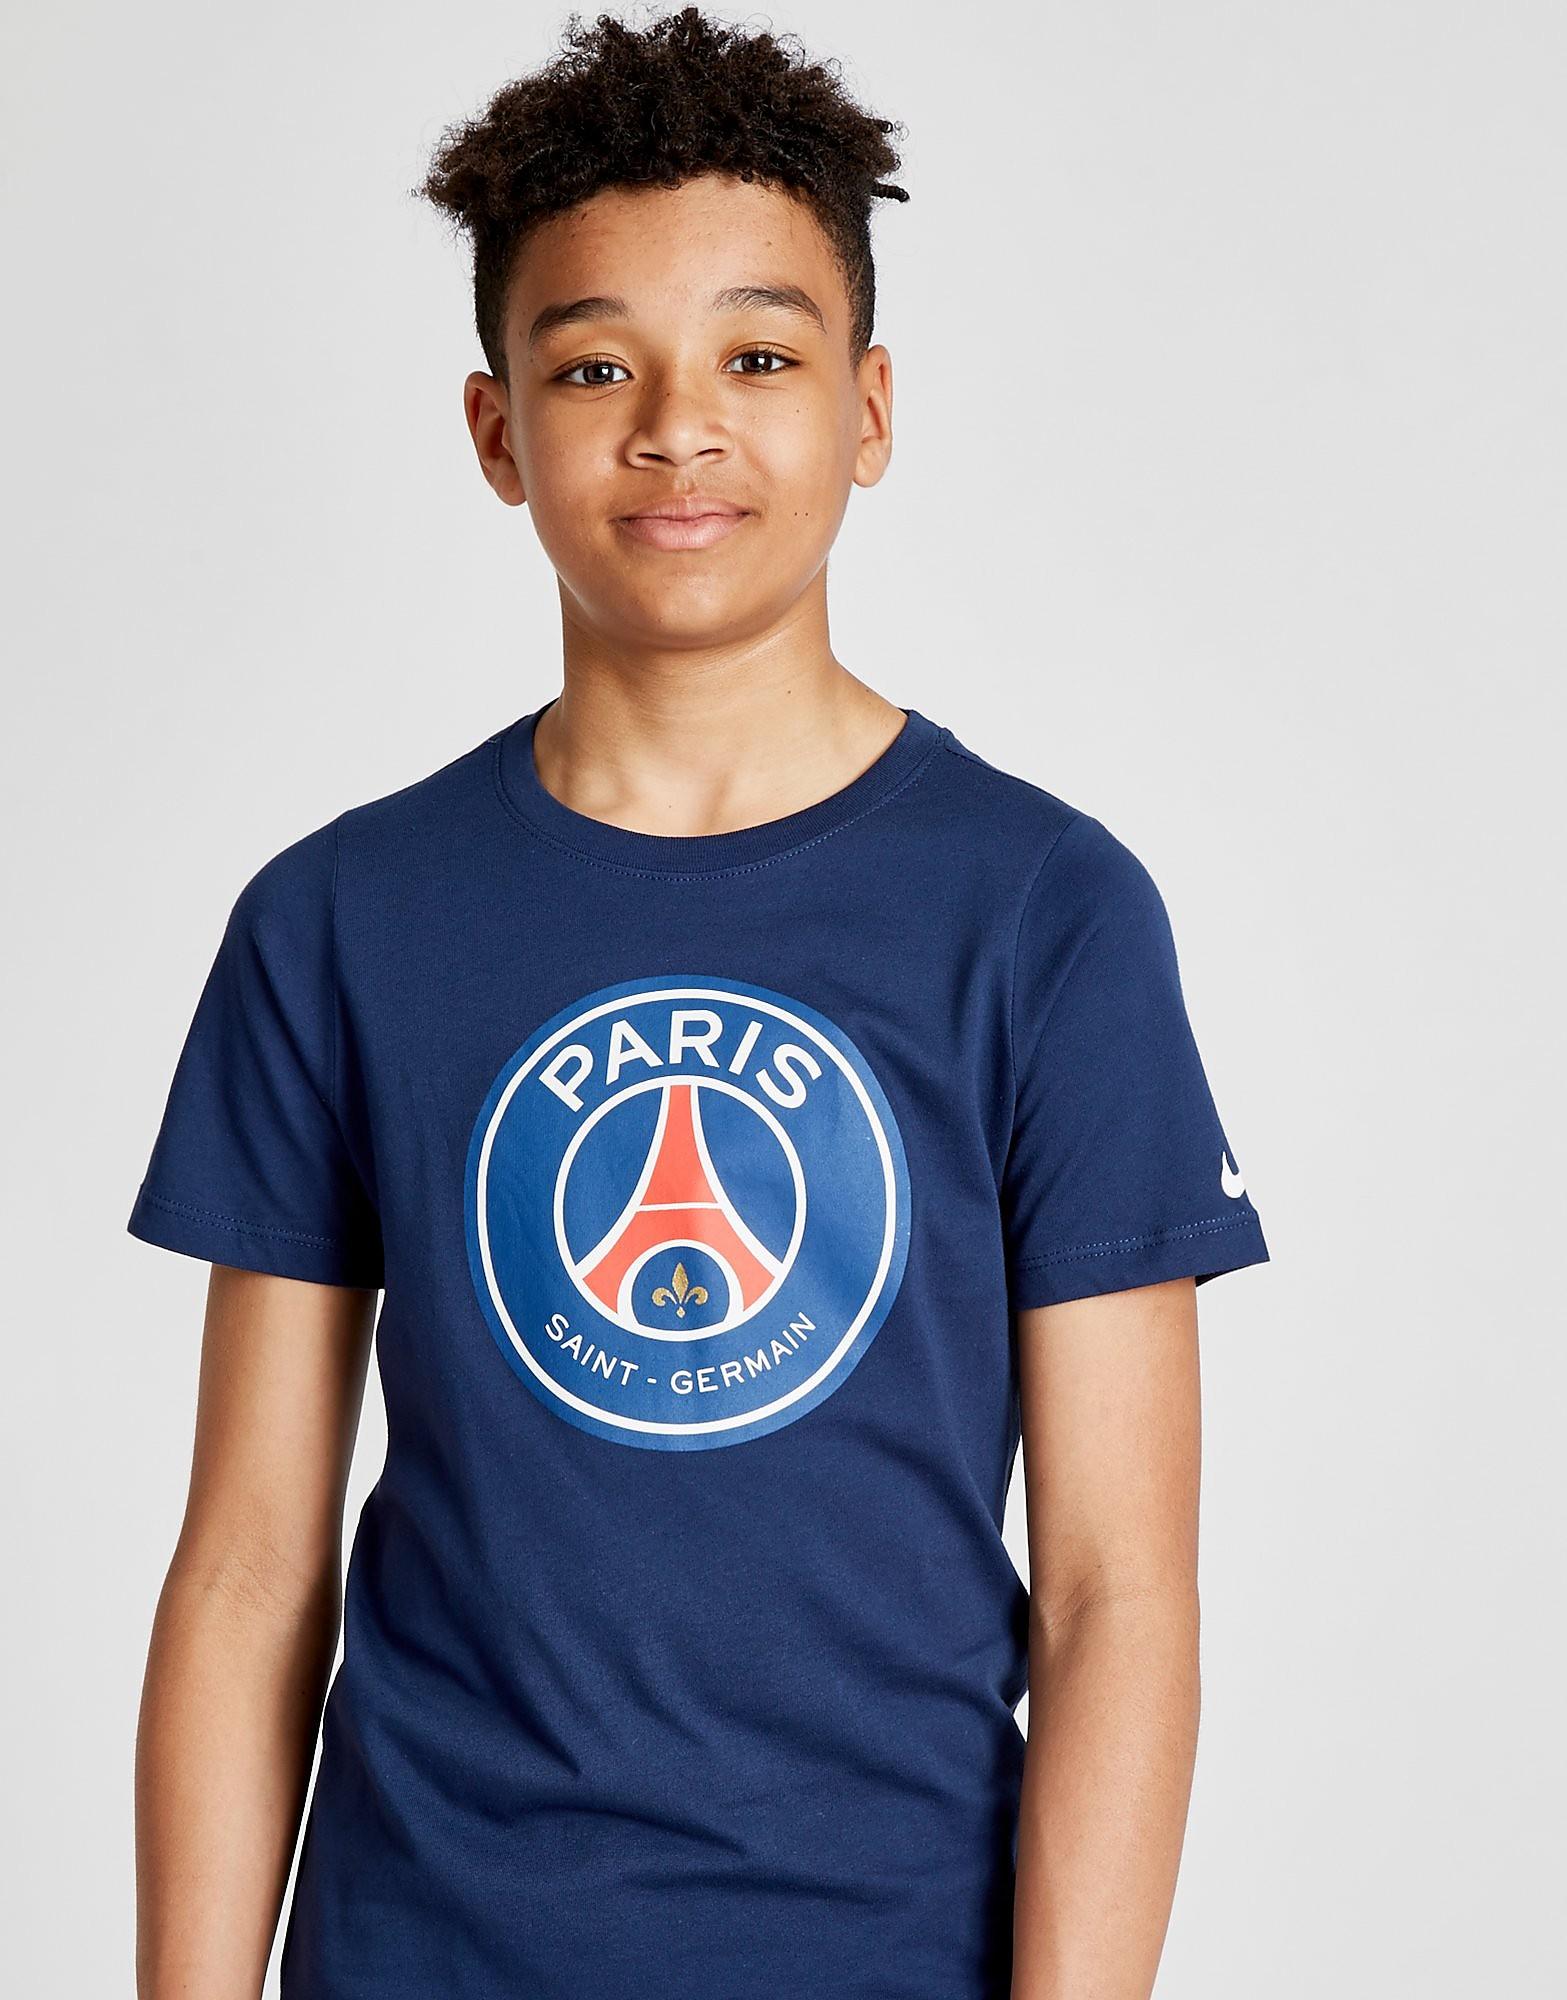 Nike T-shirt Crest Paris Saint Germain 2018/19 Junior